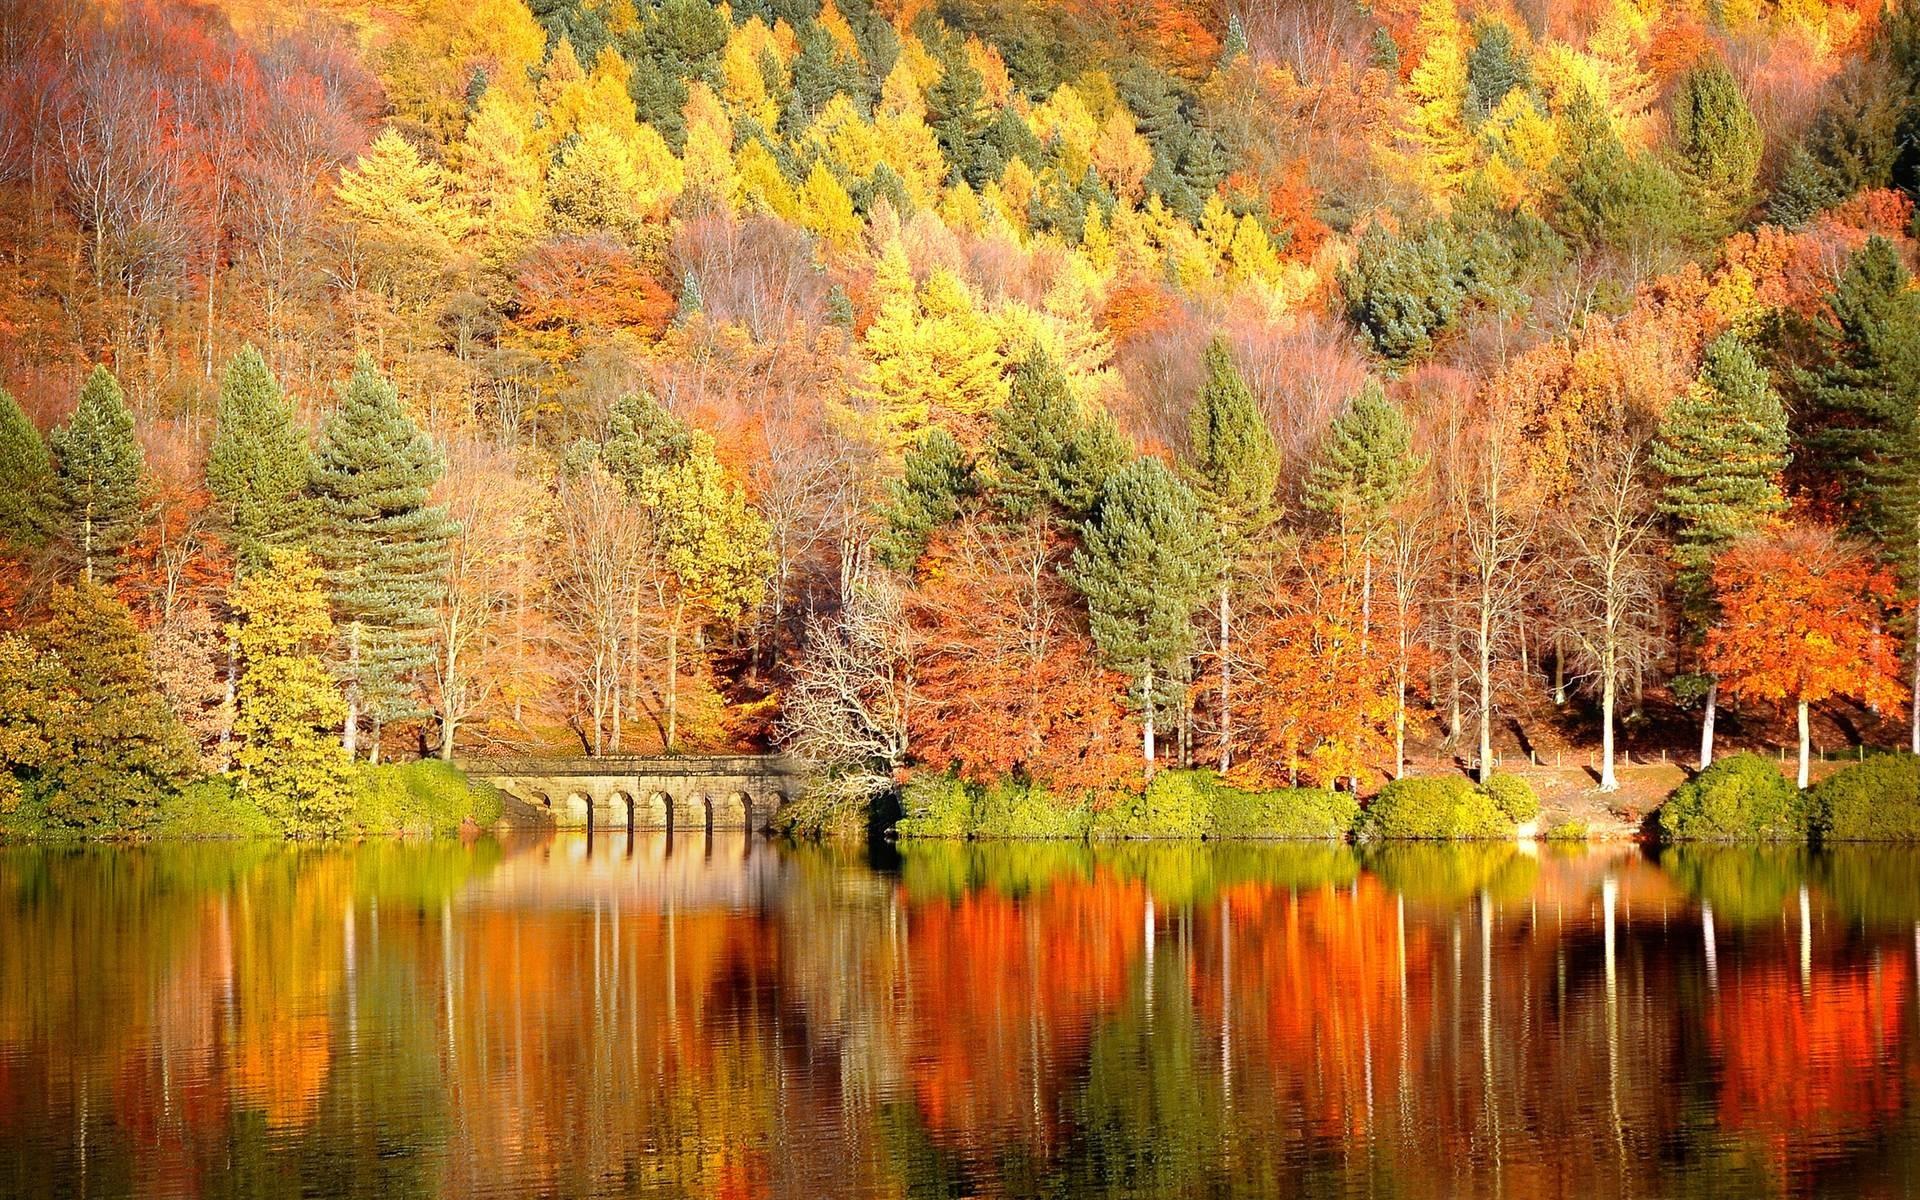 Fall Wallpaper Hd Download Free Wallpapers For Desktop: Fall Backgrounds Desktop ·① WallpaperTag